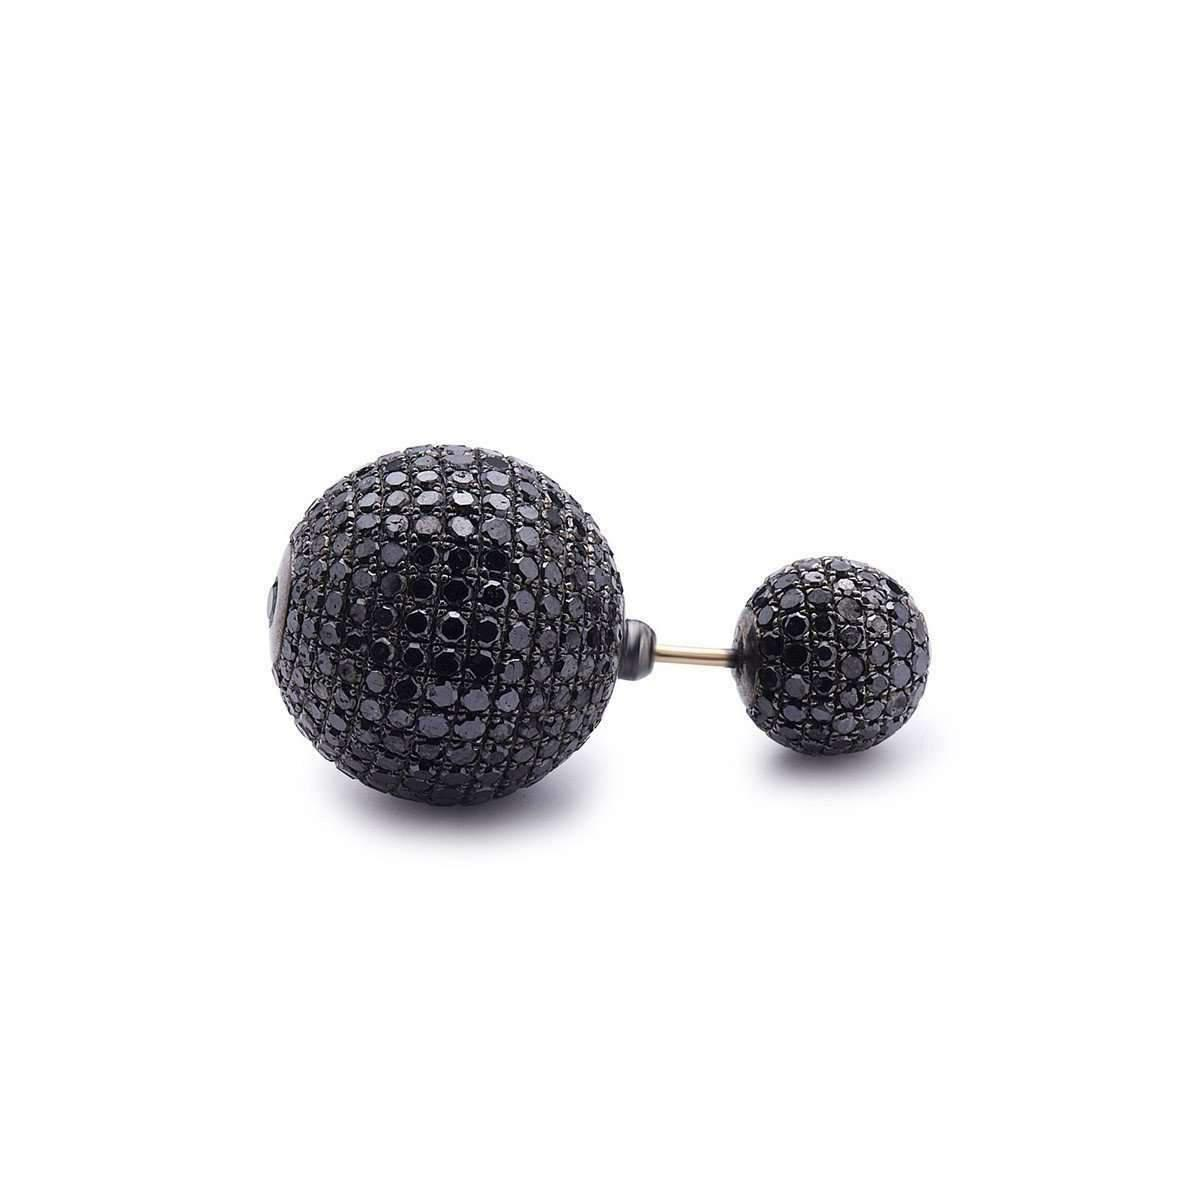 Socheec Black Diamond Ball Earring HU8i4nPT5